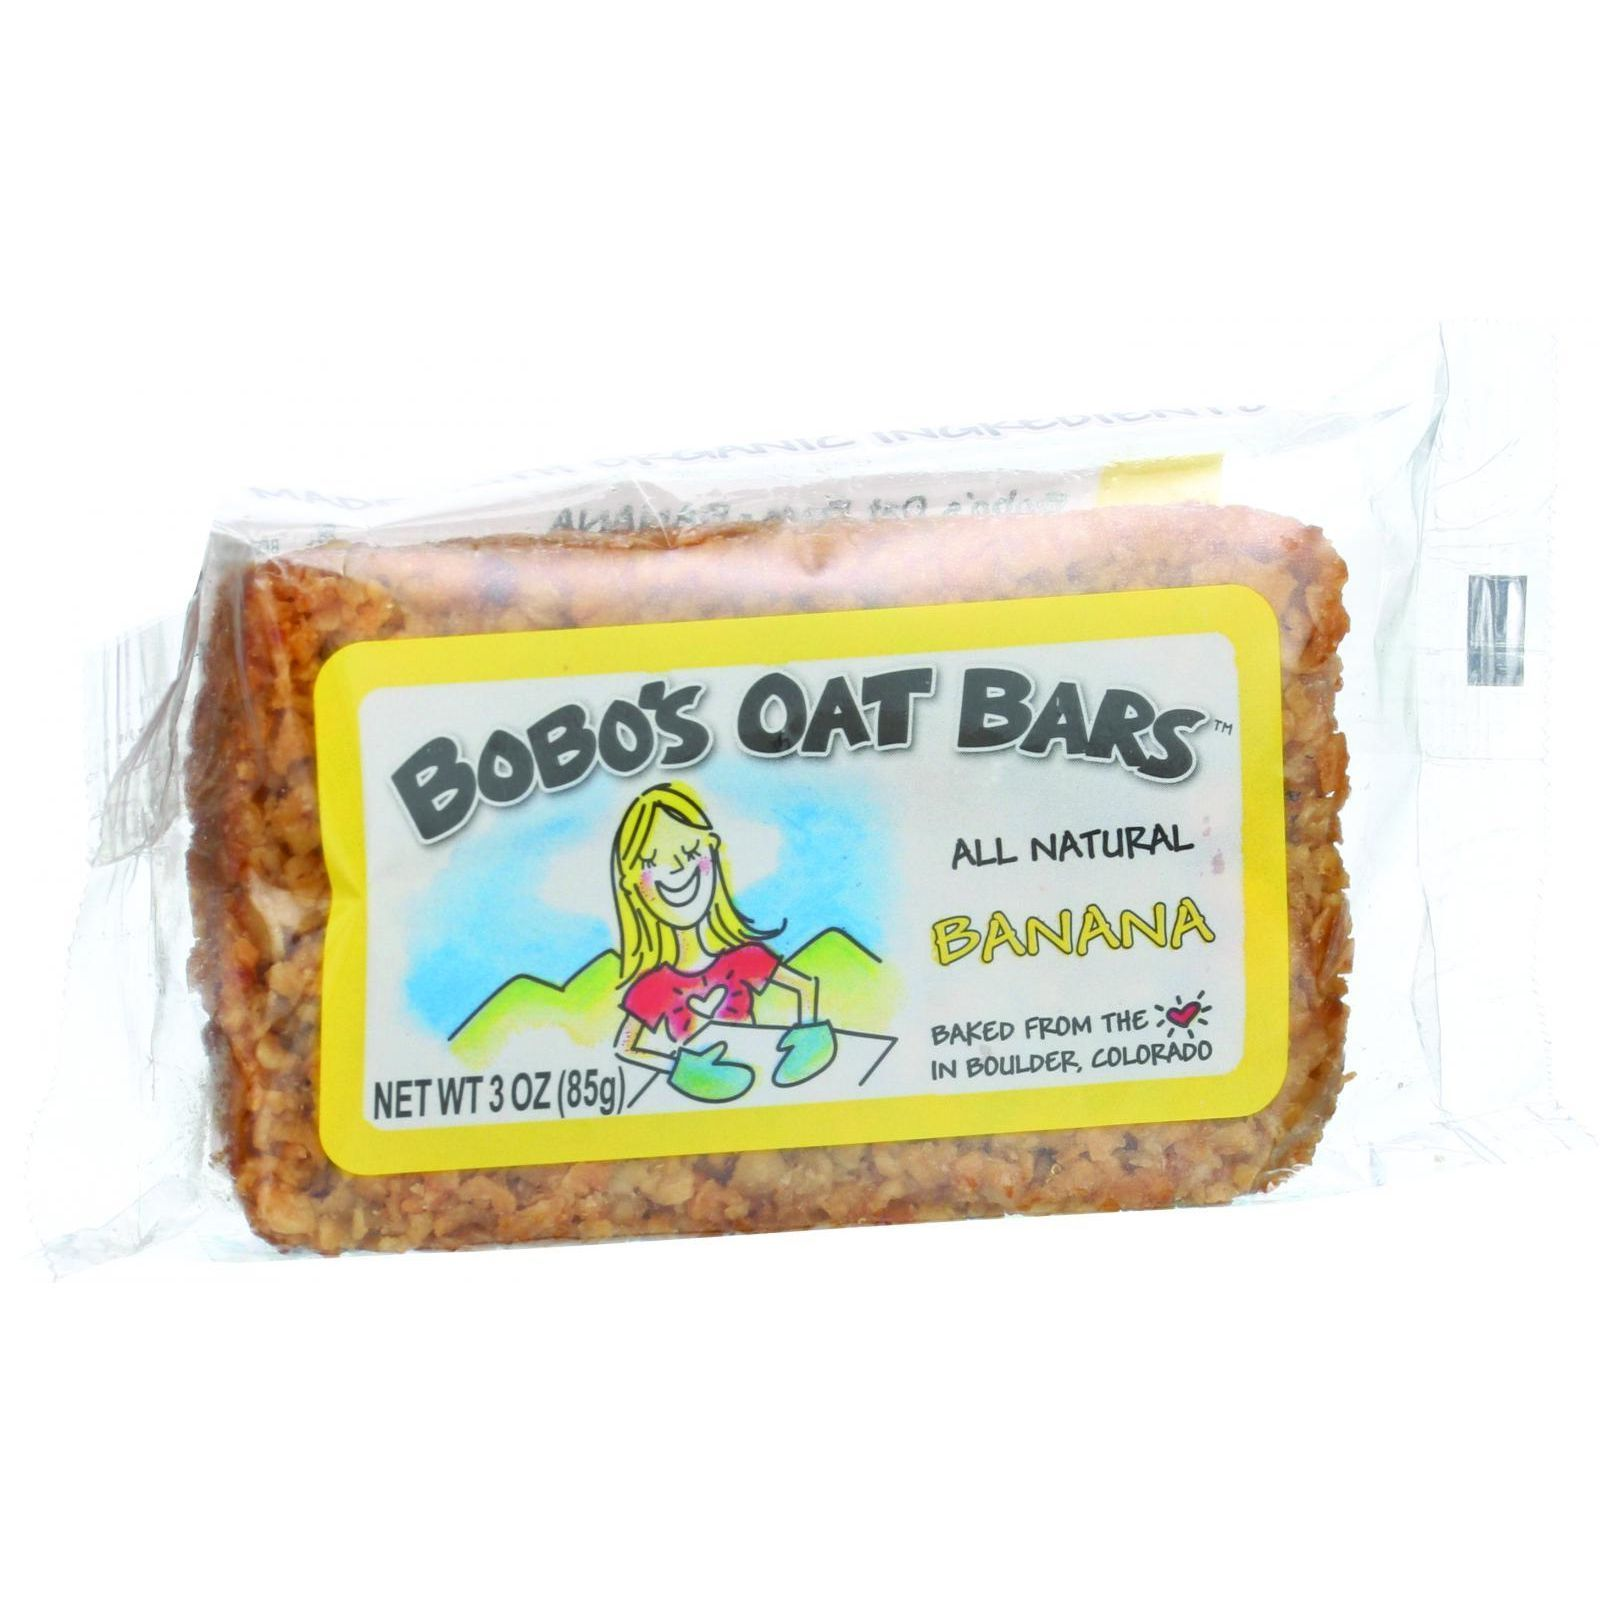 Bobo's Oat Bars - All Natural - Banana - 3 oz Bars - Case of 12